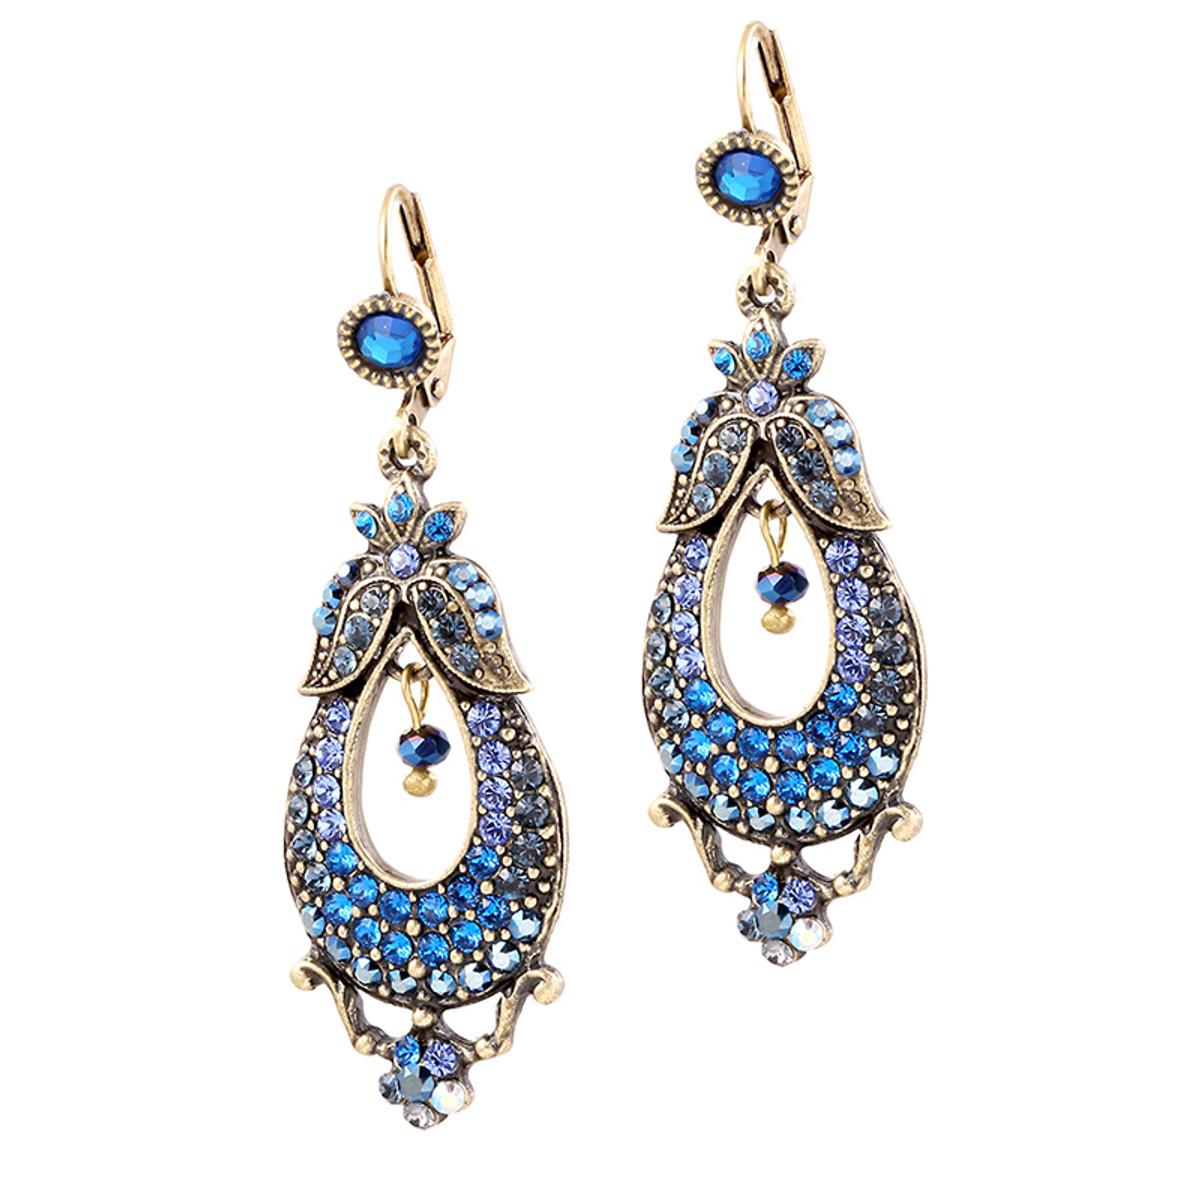 Michal Negrin Pear Earrings - Multi Color